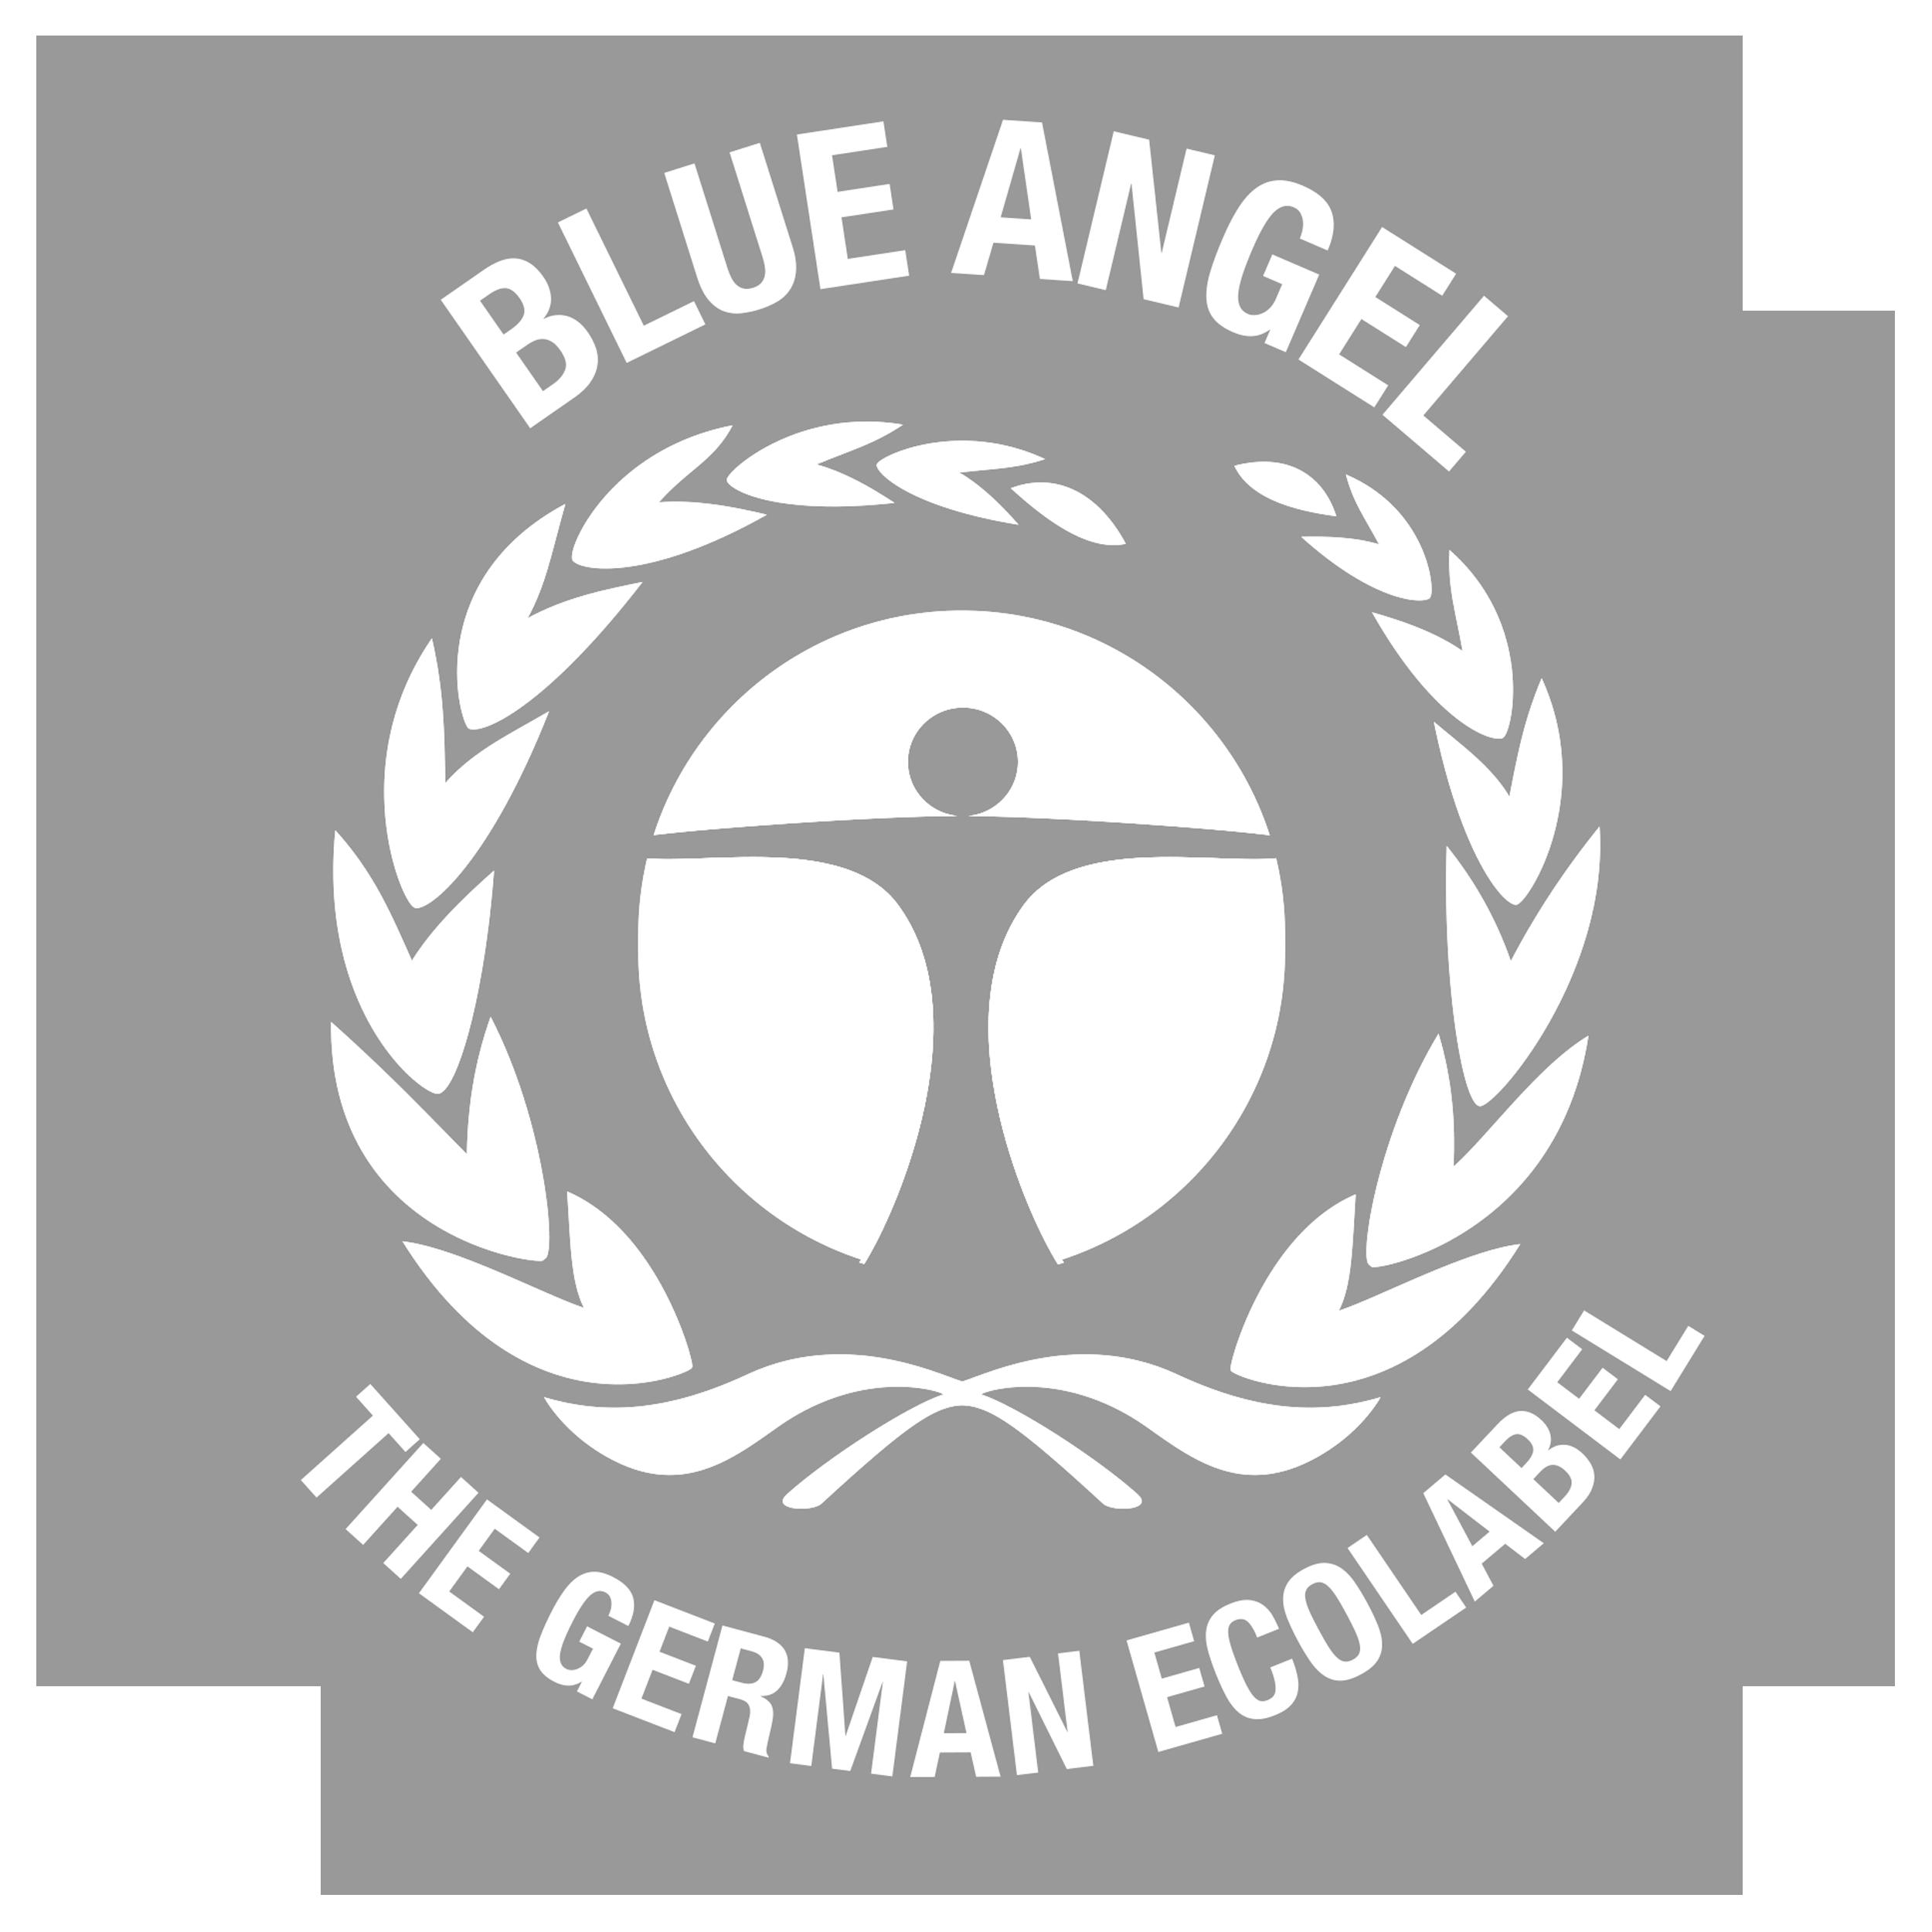 Der Blaue Engel